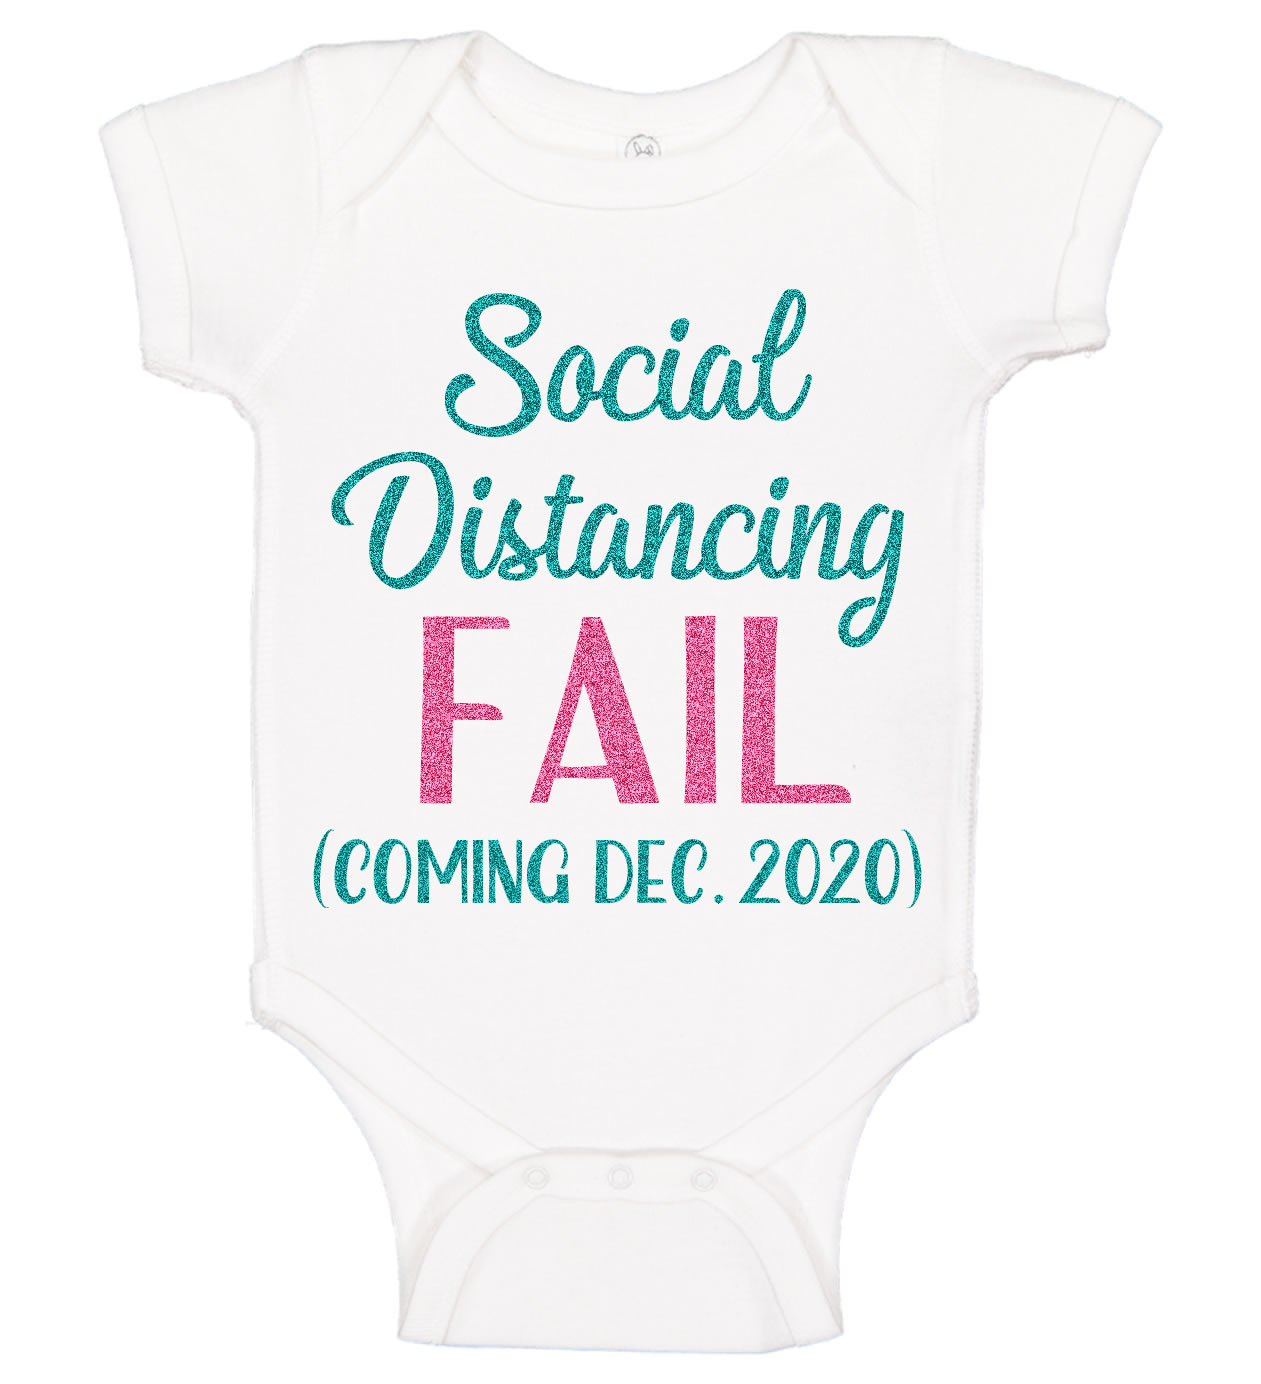 Social Distancing Onesie